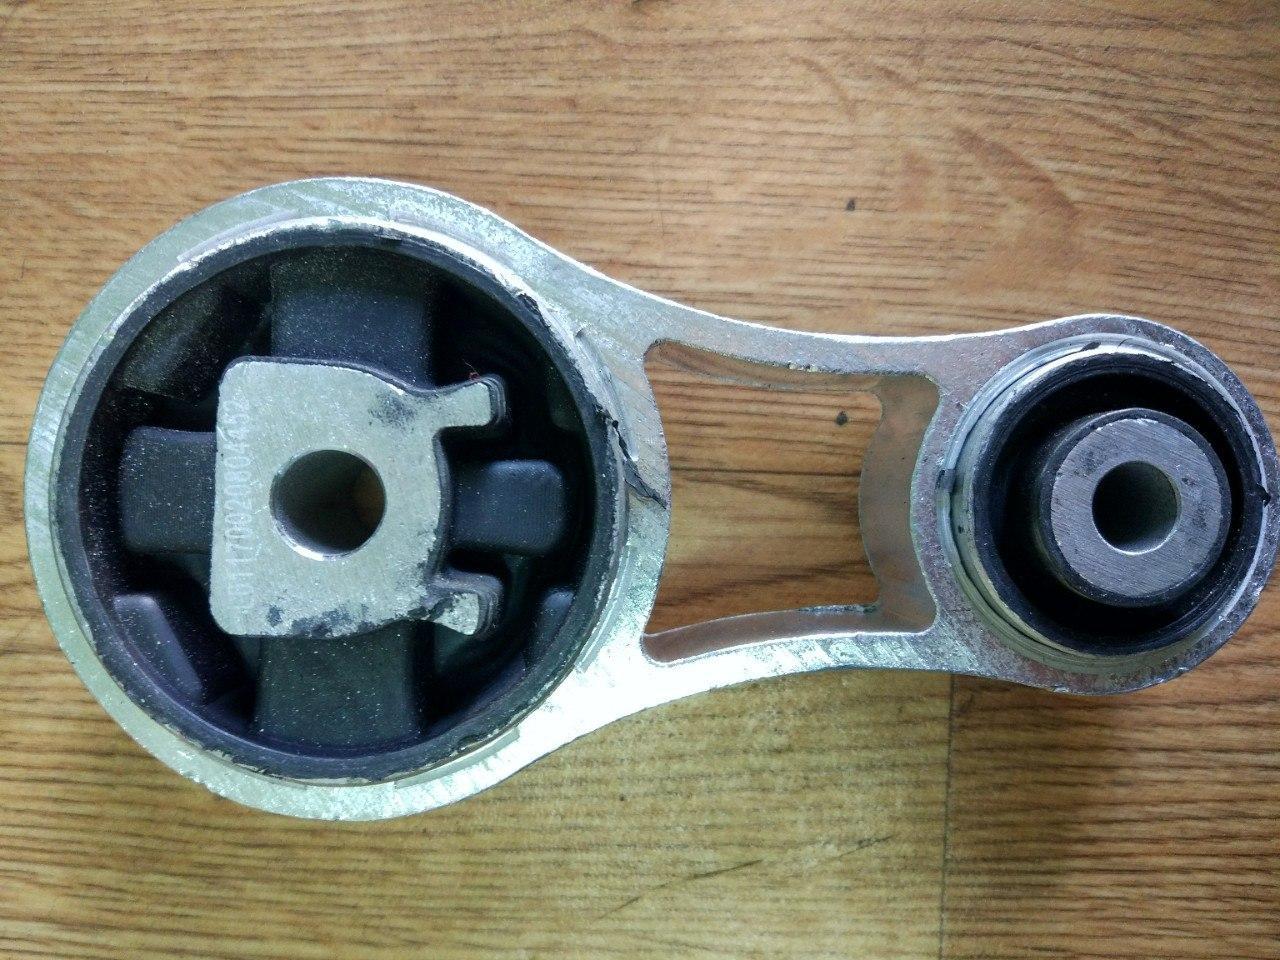 Подушка двигуна (вісімка, нижня) Renault Trafic, Opel Vivaro 1.9, 2001-2006 Metalcauho 04452